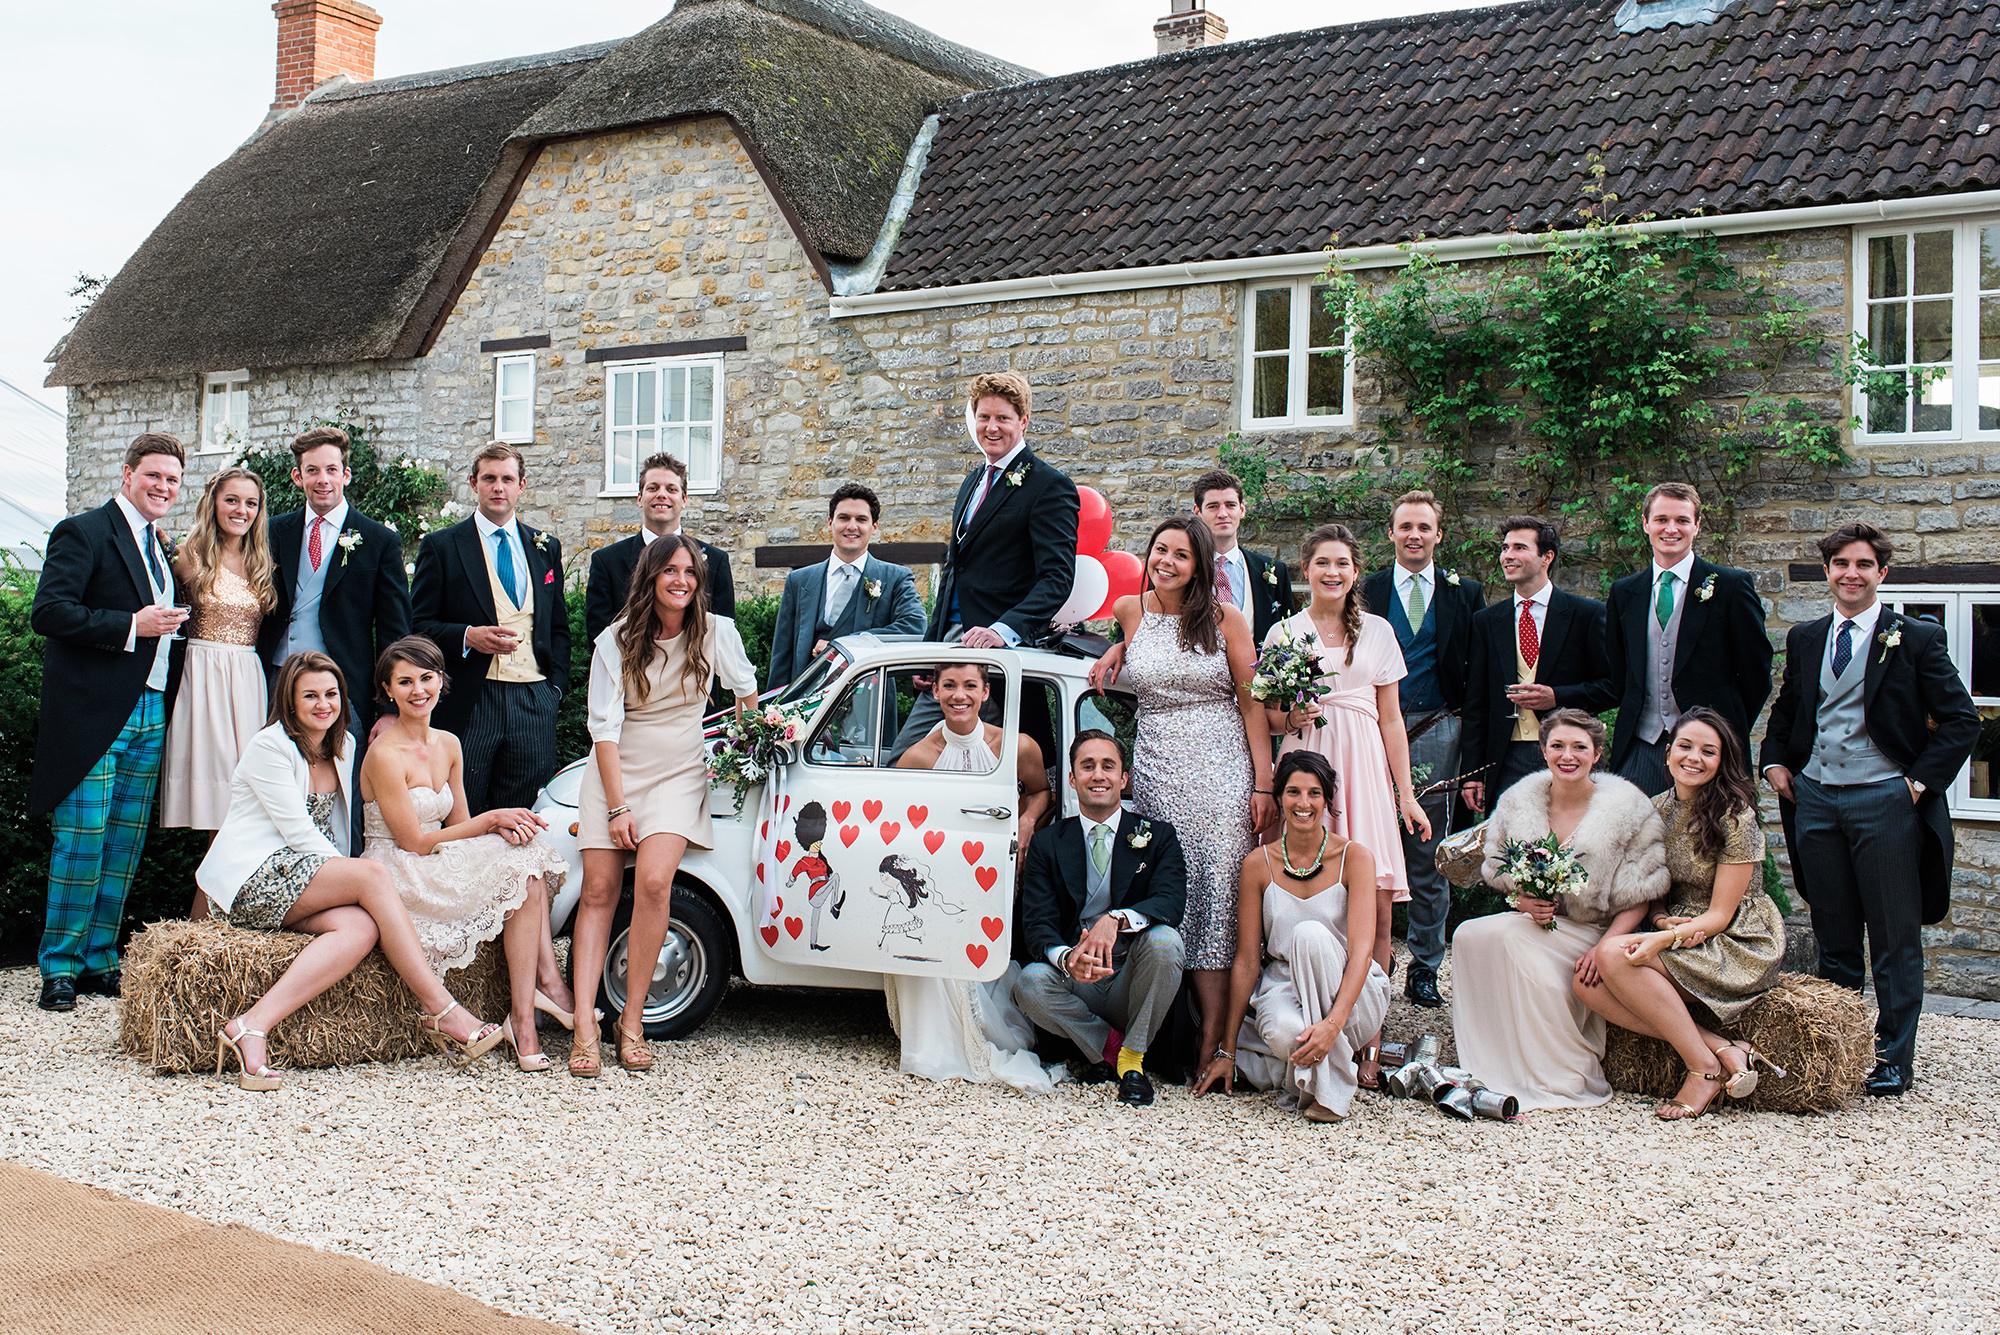 Simon biffen-best of 2015 wedding photographs-77